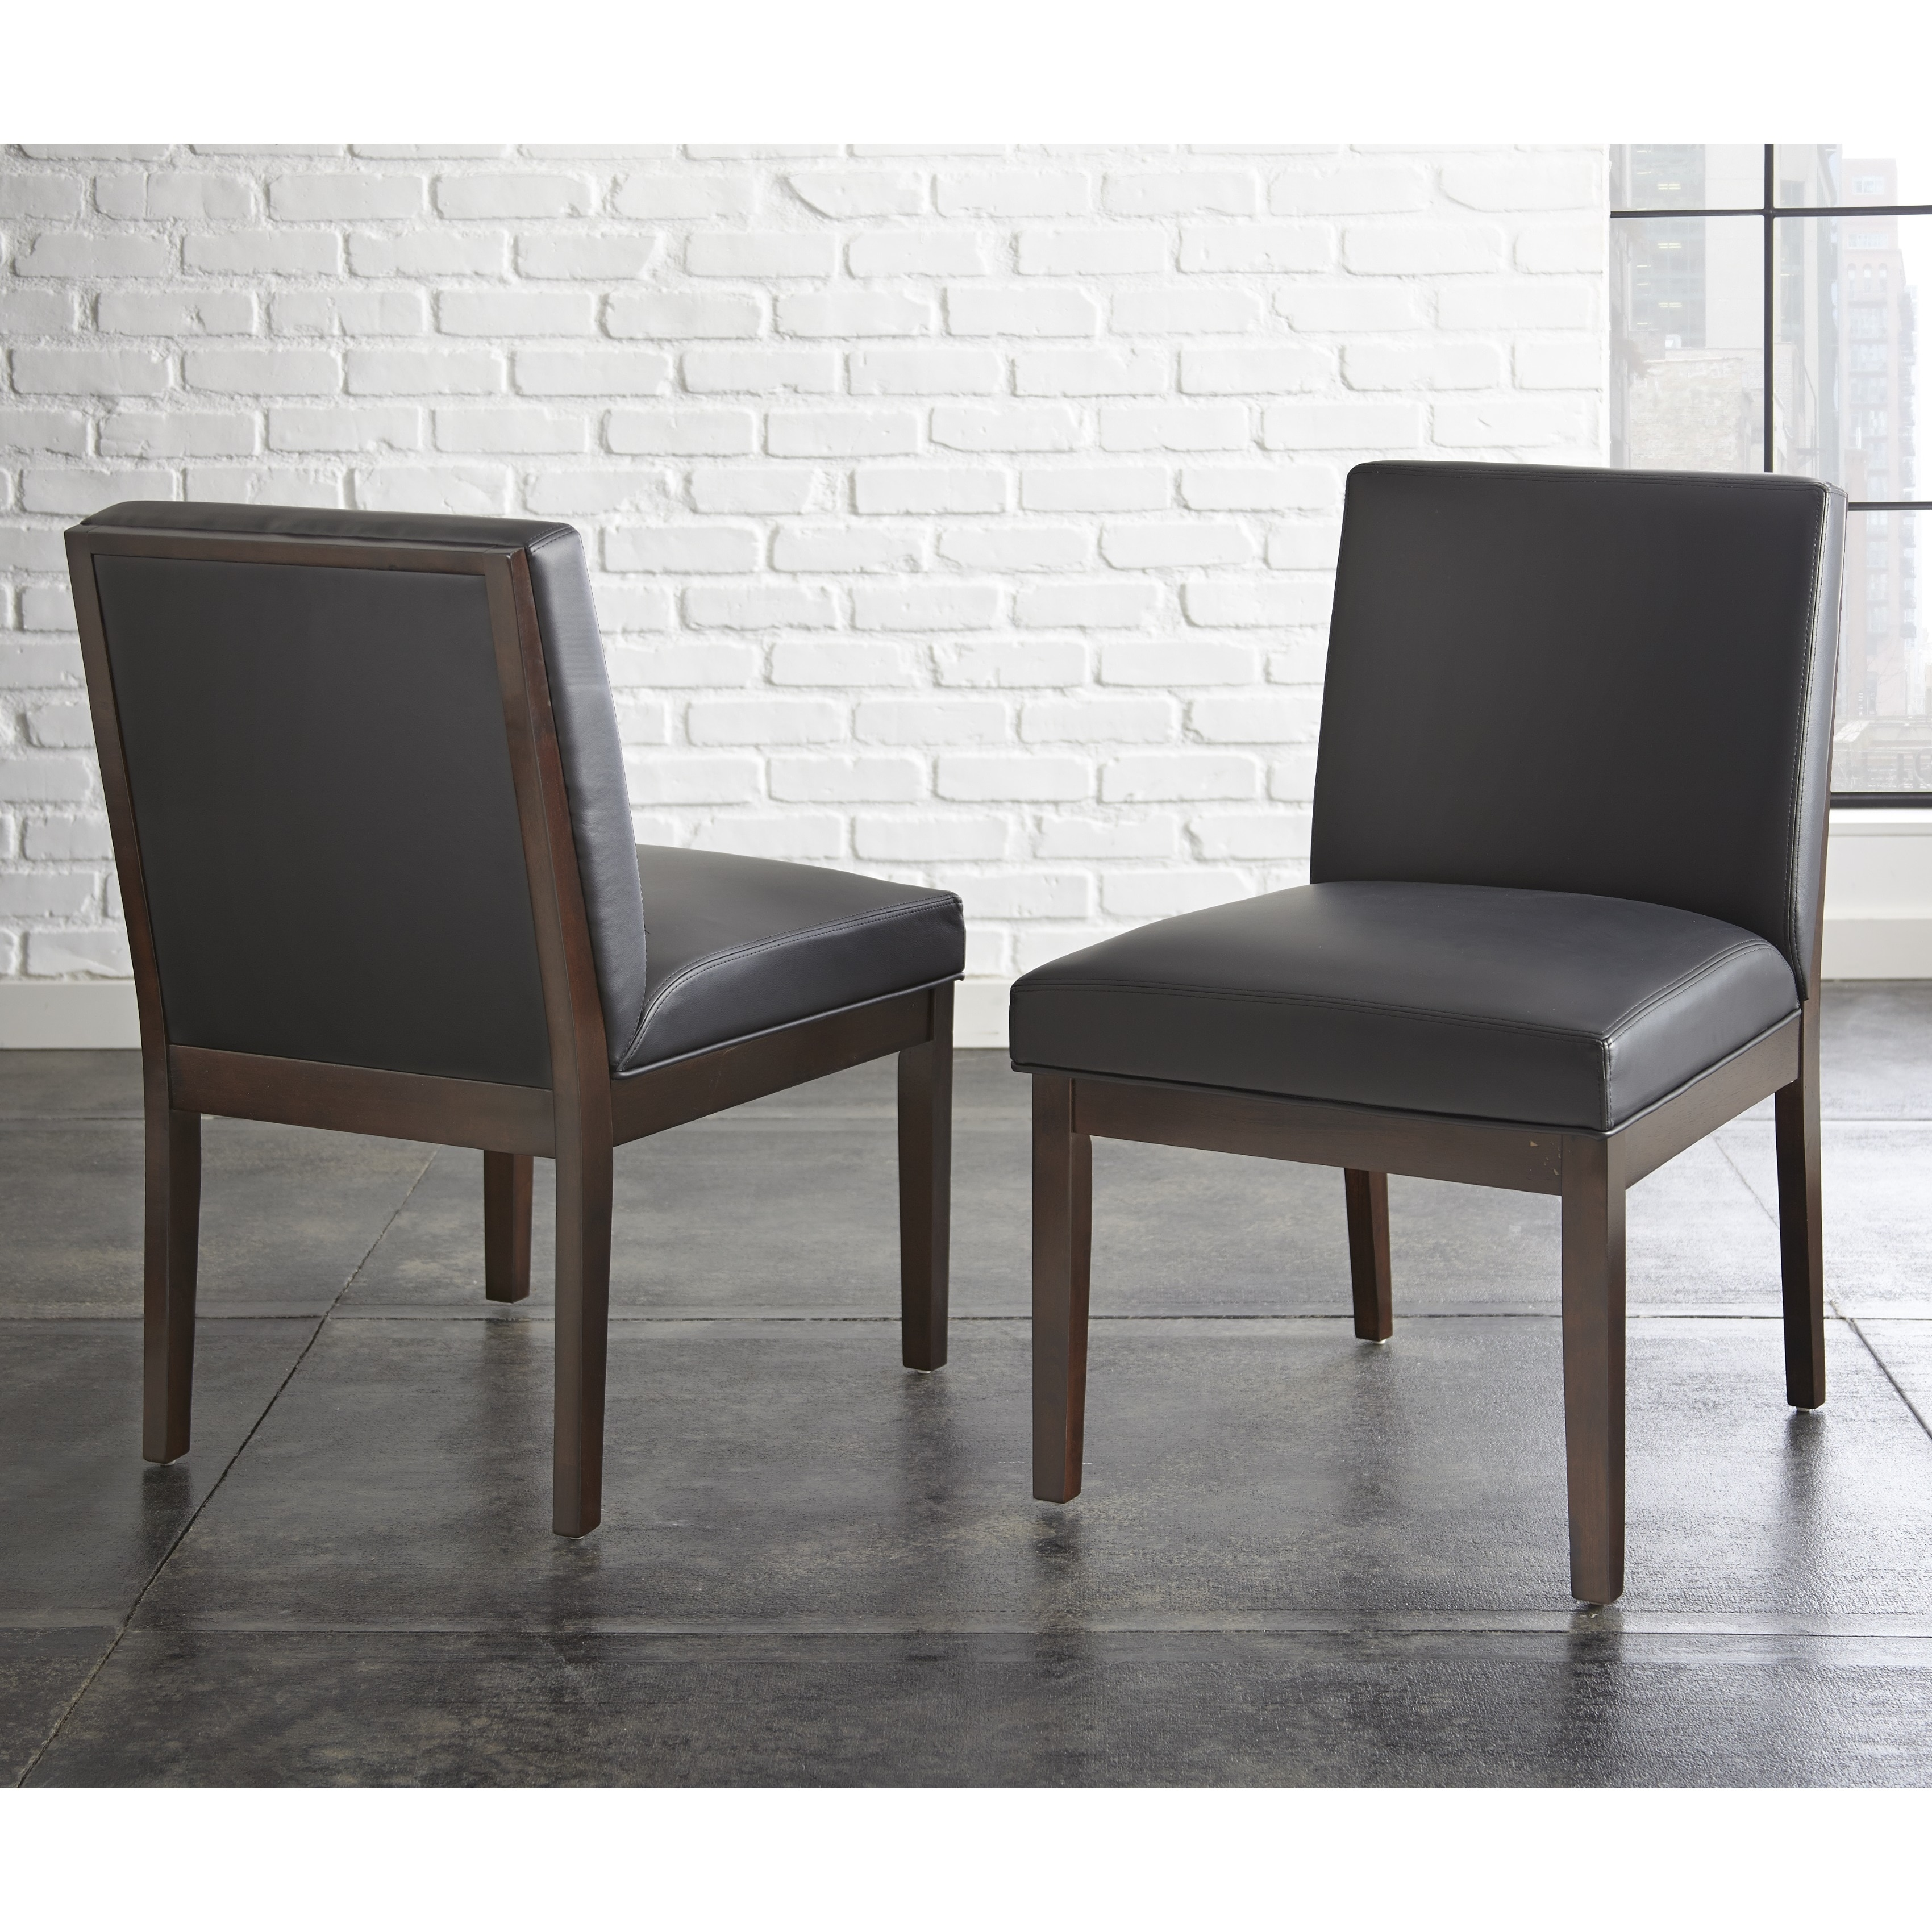 Greyson Living Zuri Bonded Leather Chair Set